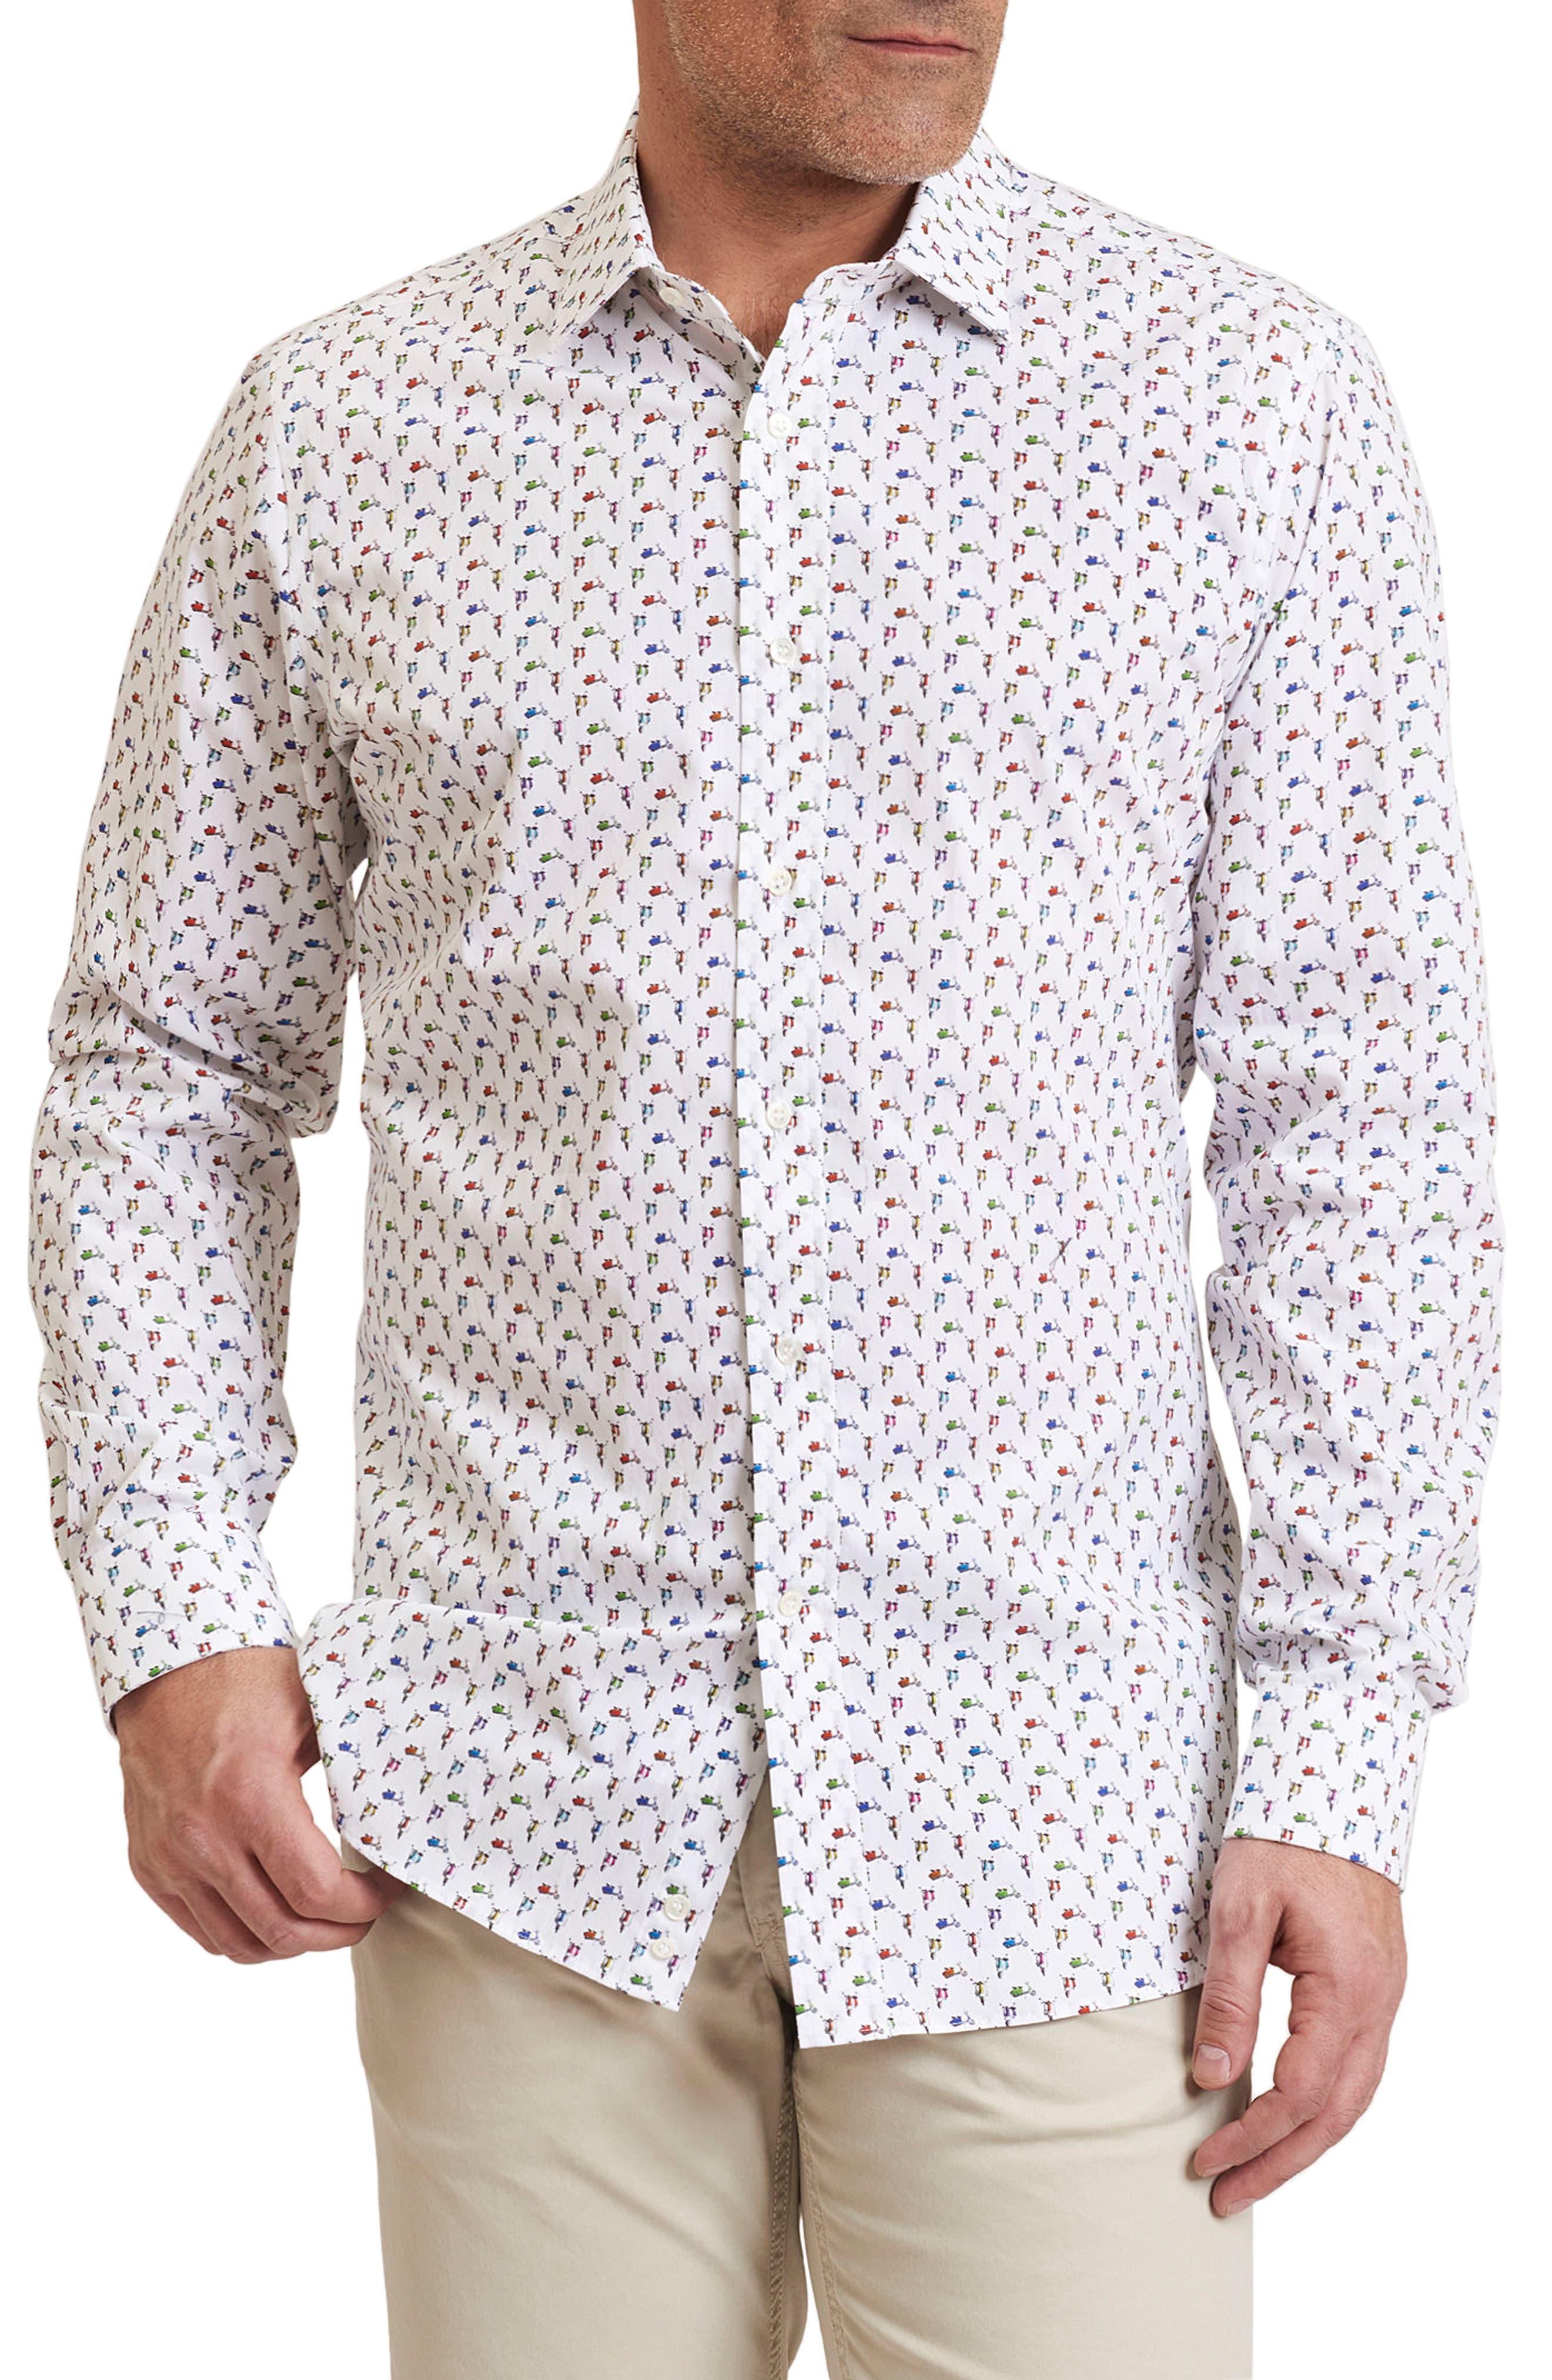 Alternate Image 1 Selected - Robert Graham Scooter Regular Fit Print Sport Shirt